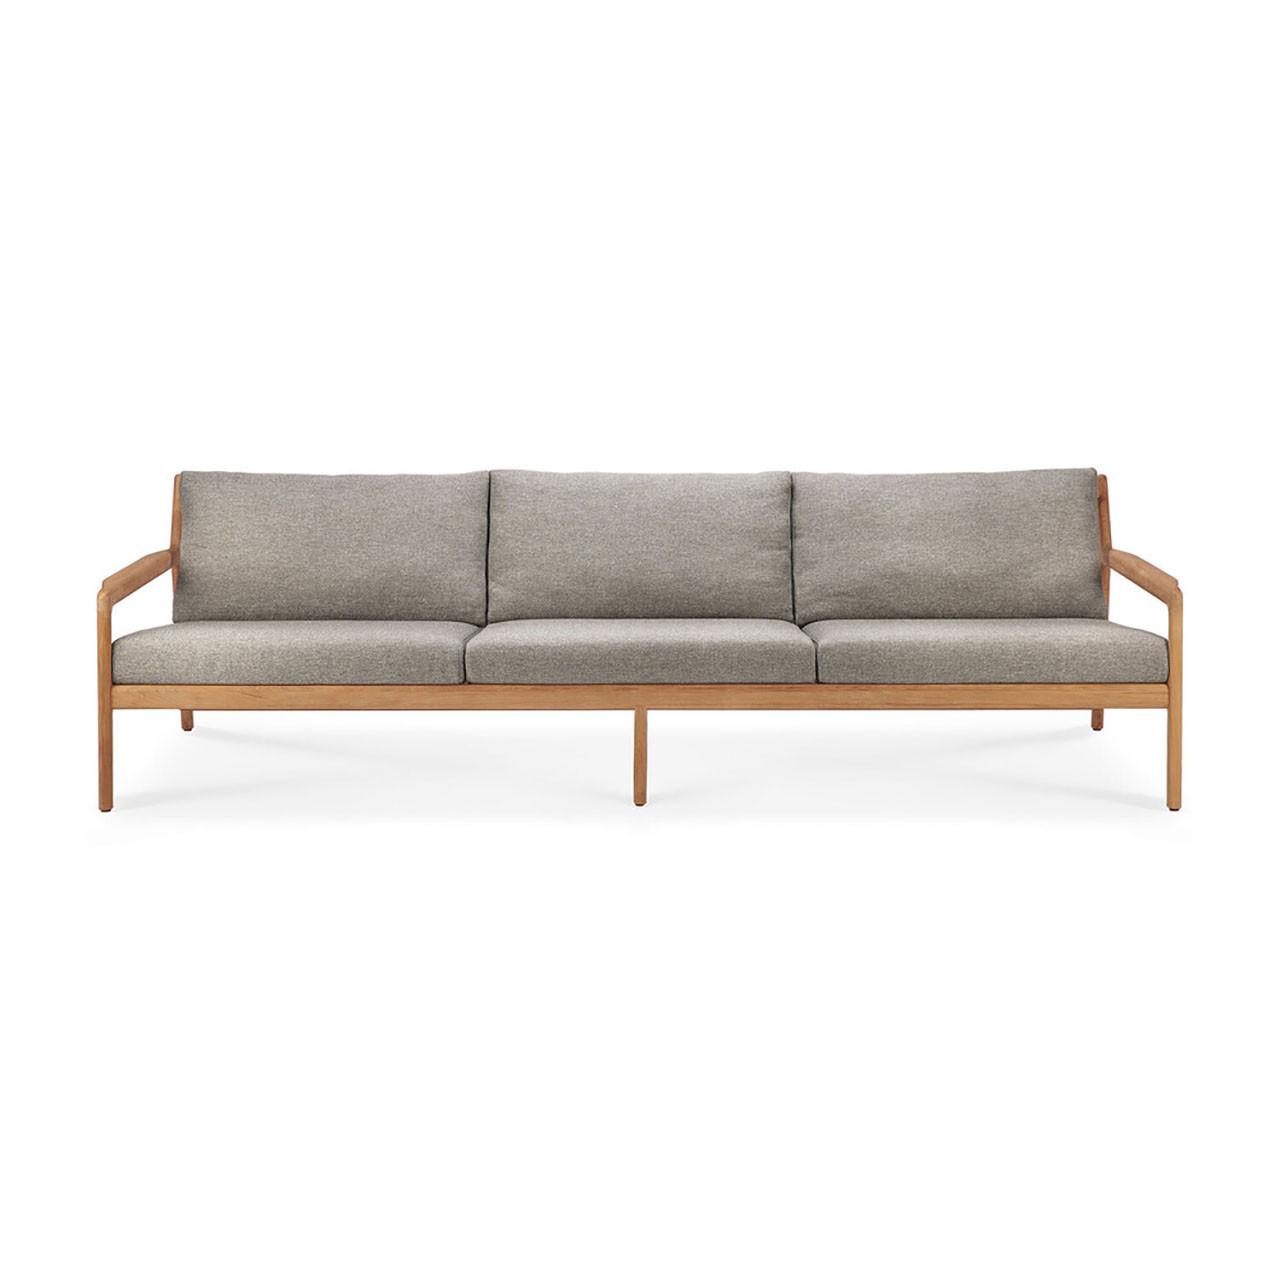 Teak Jack Outdoor 3 Seater Sofa